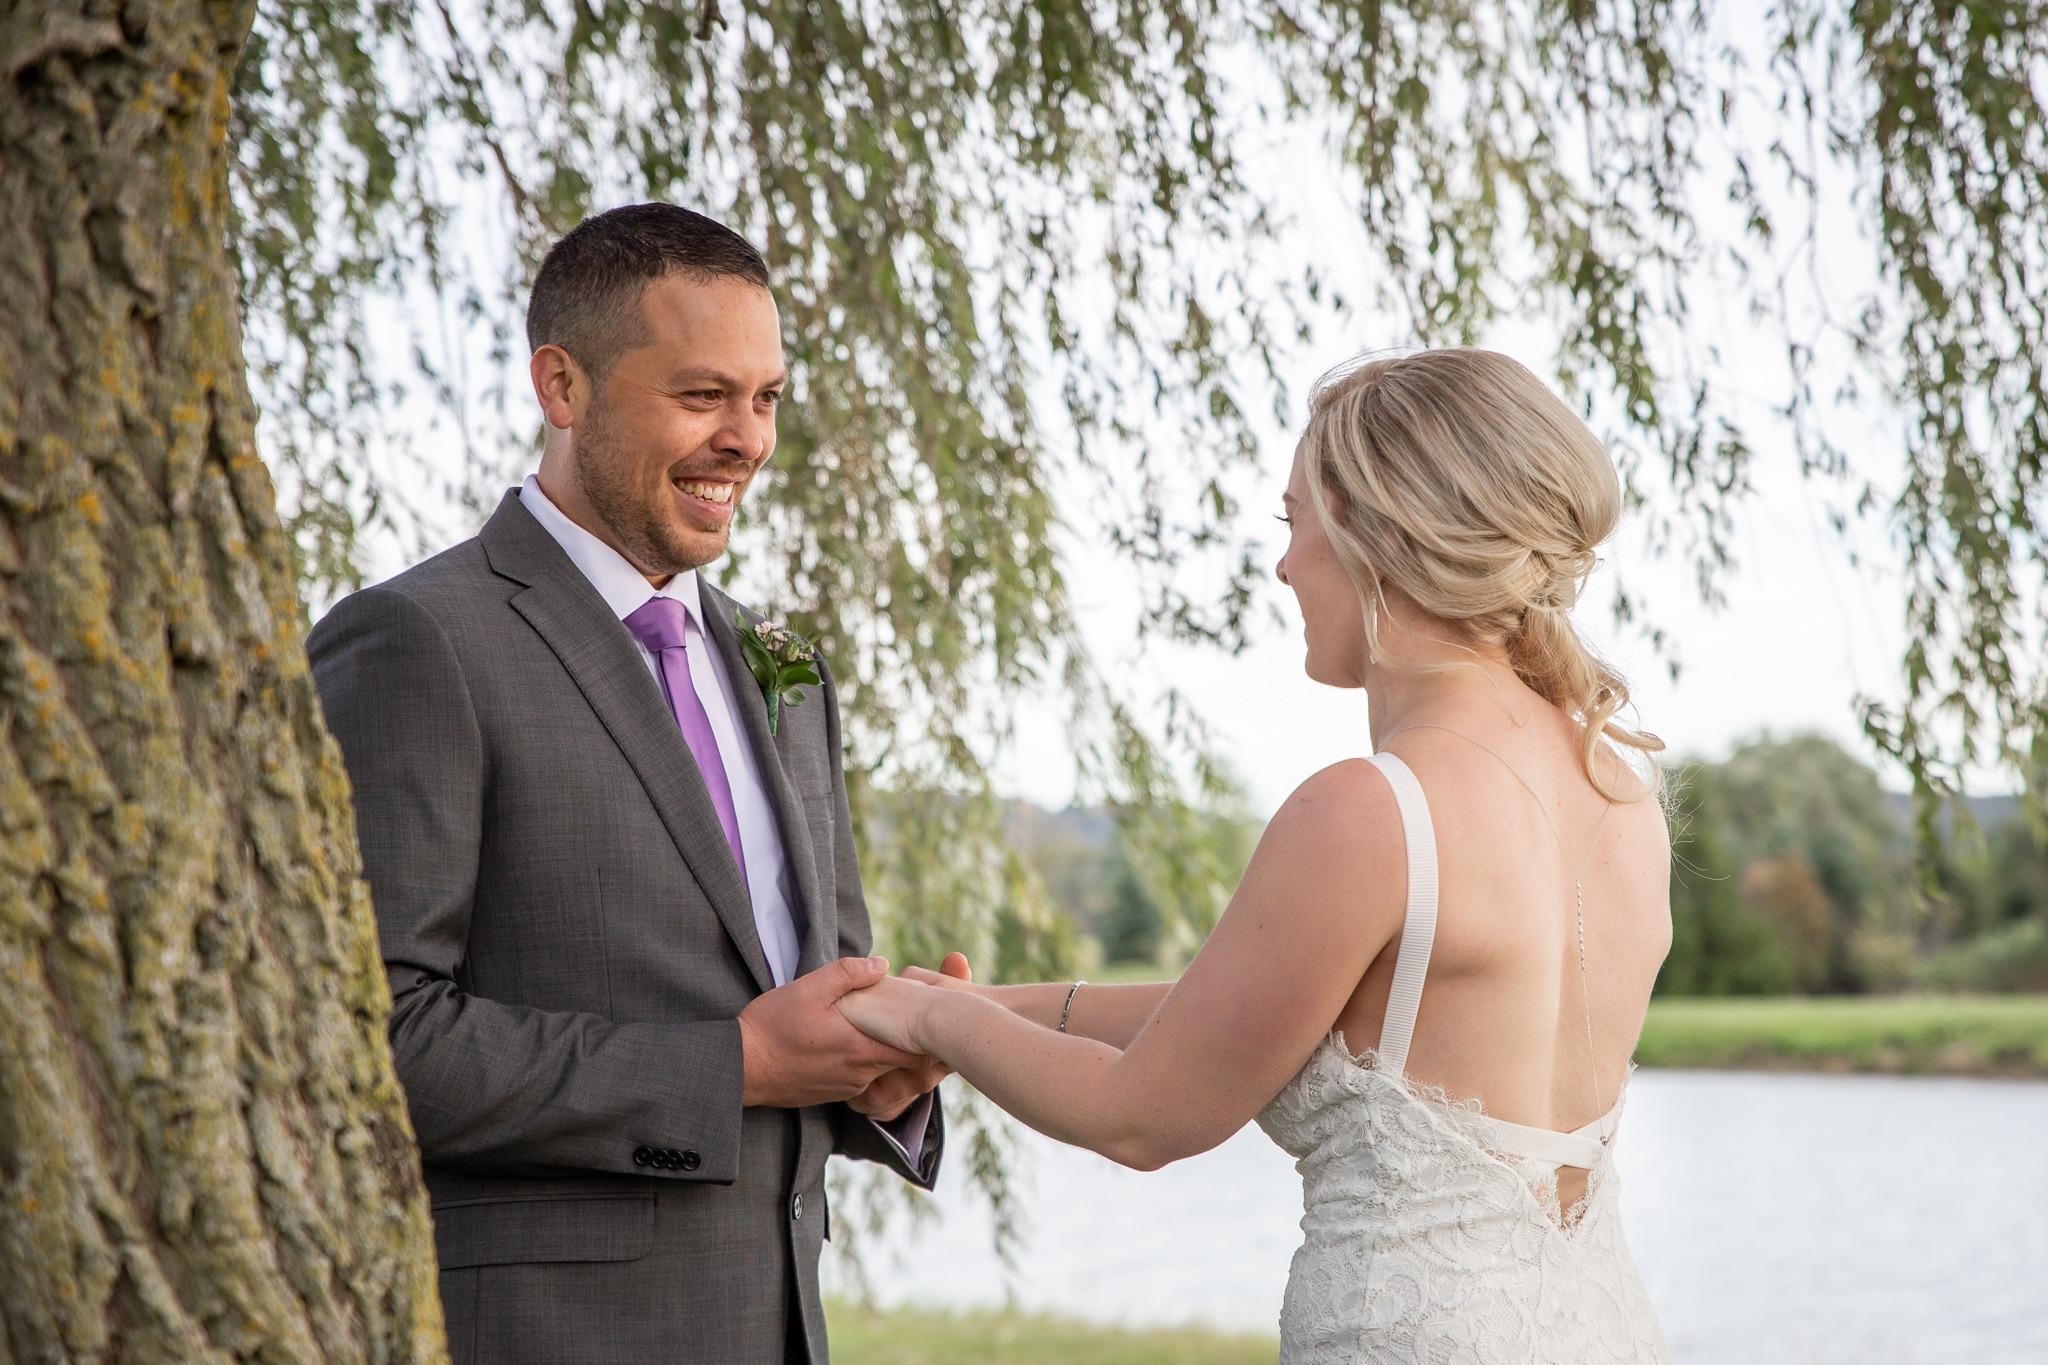 groom holds his bride's hands